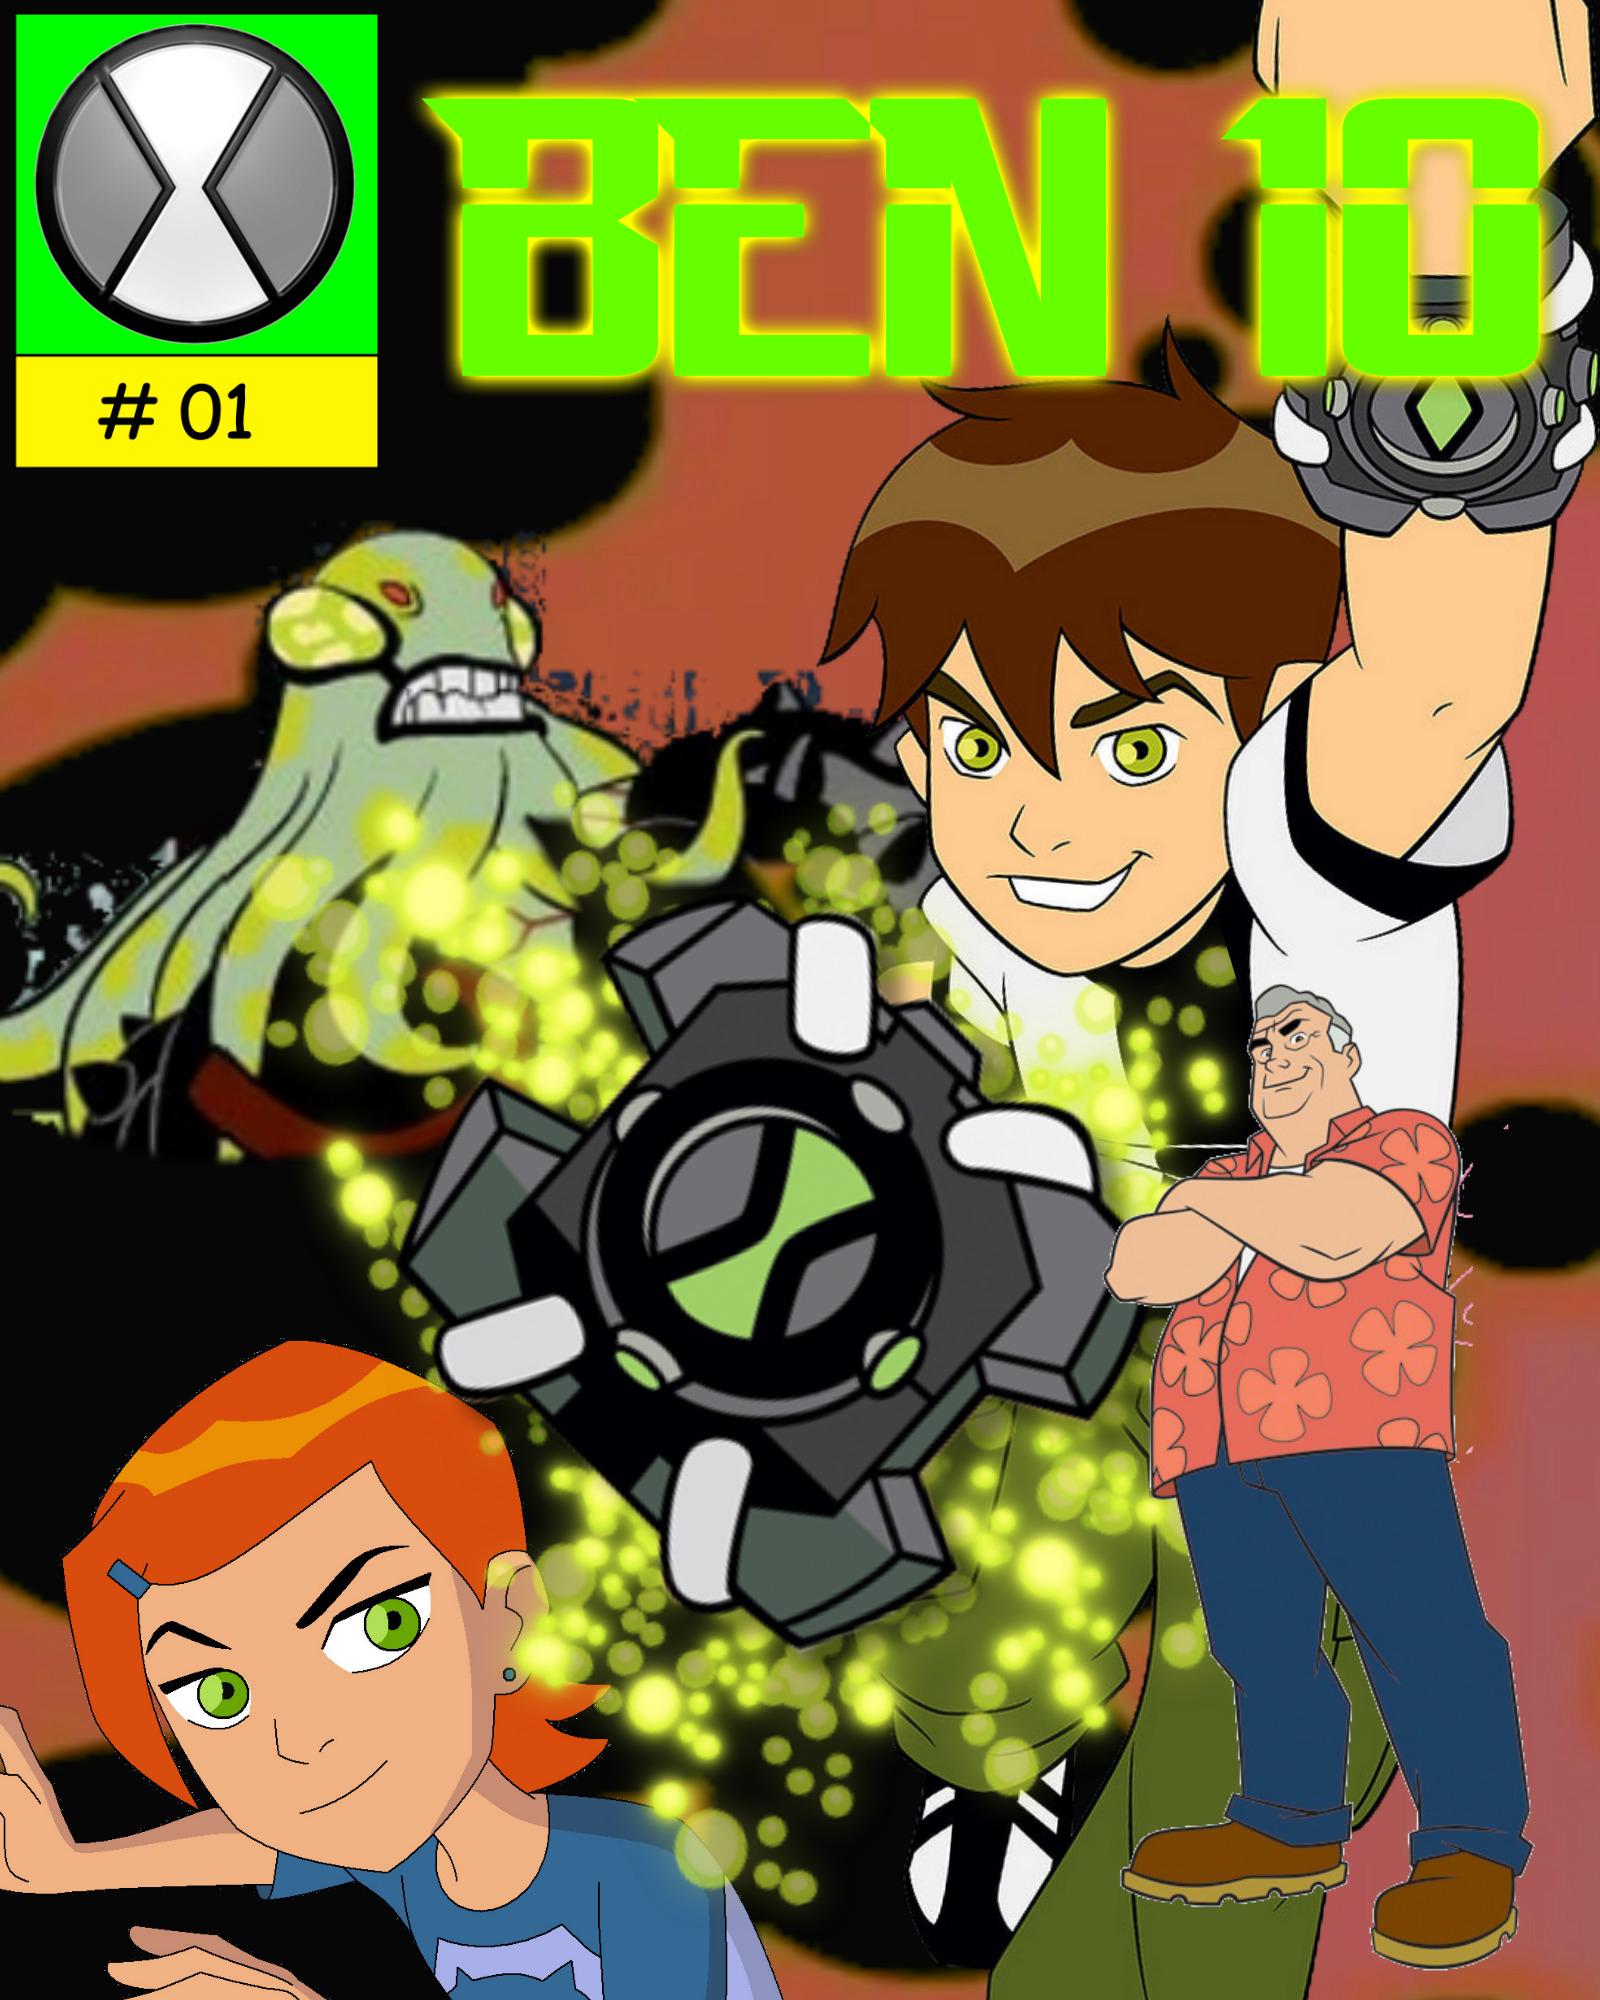 Ben 10 Fan Comics #01 Cover By RED-X2086 On DeviantArt